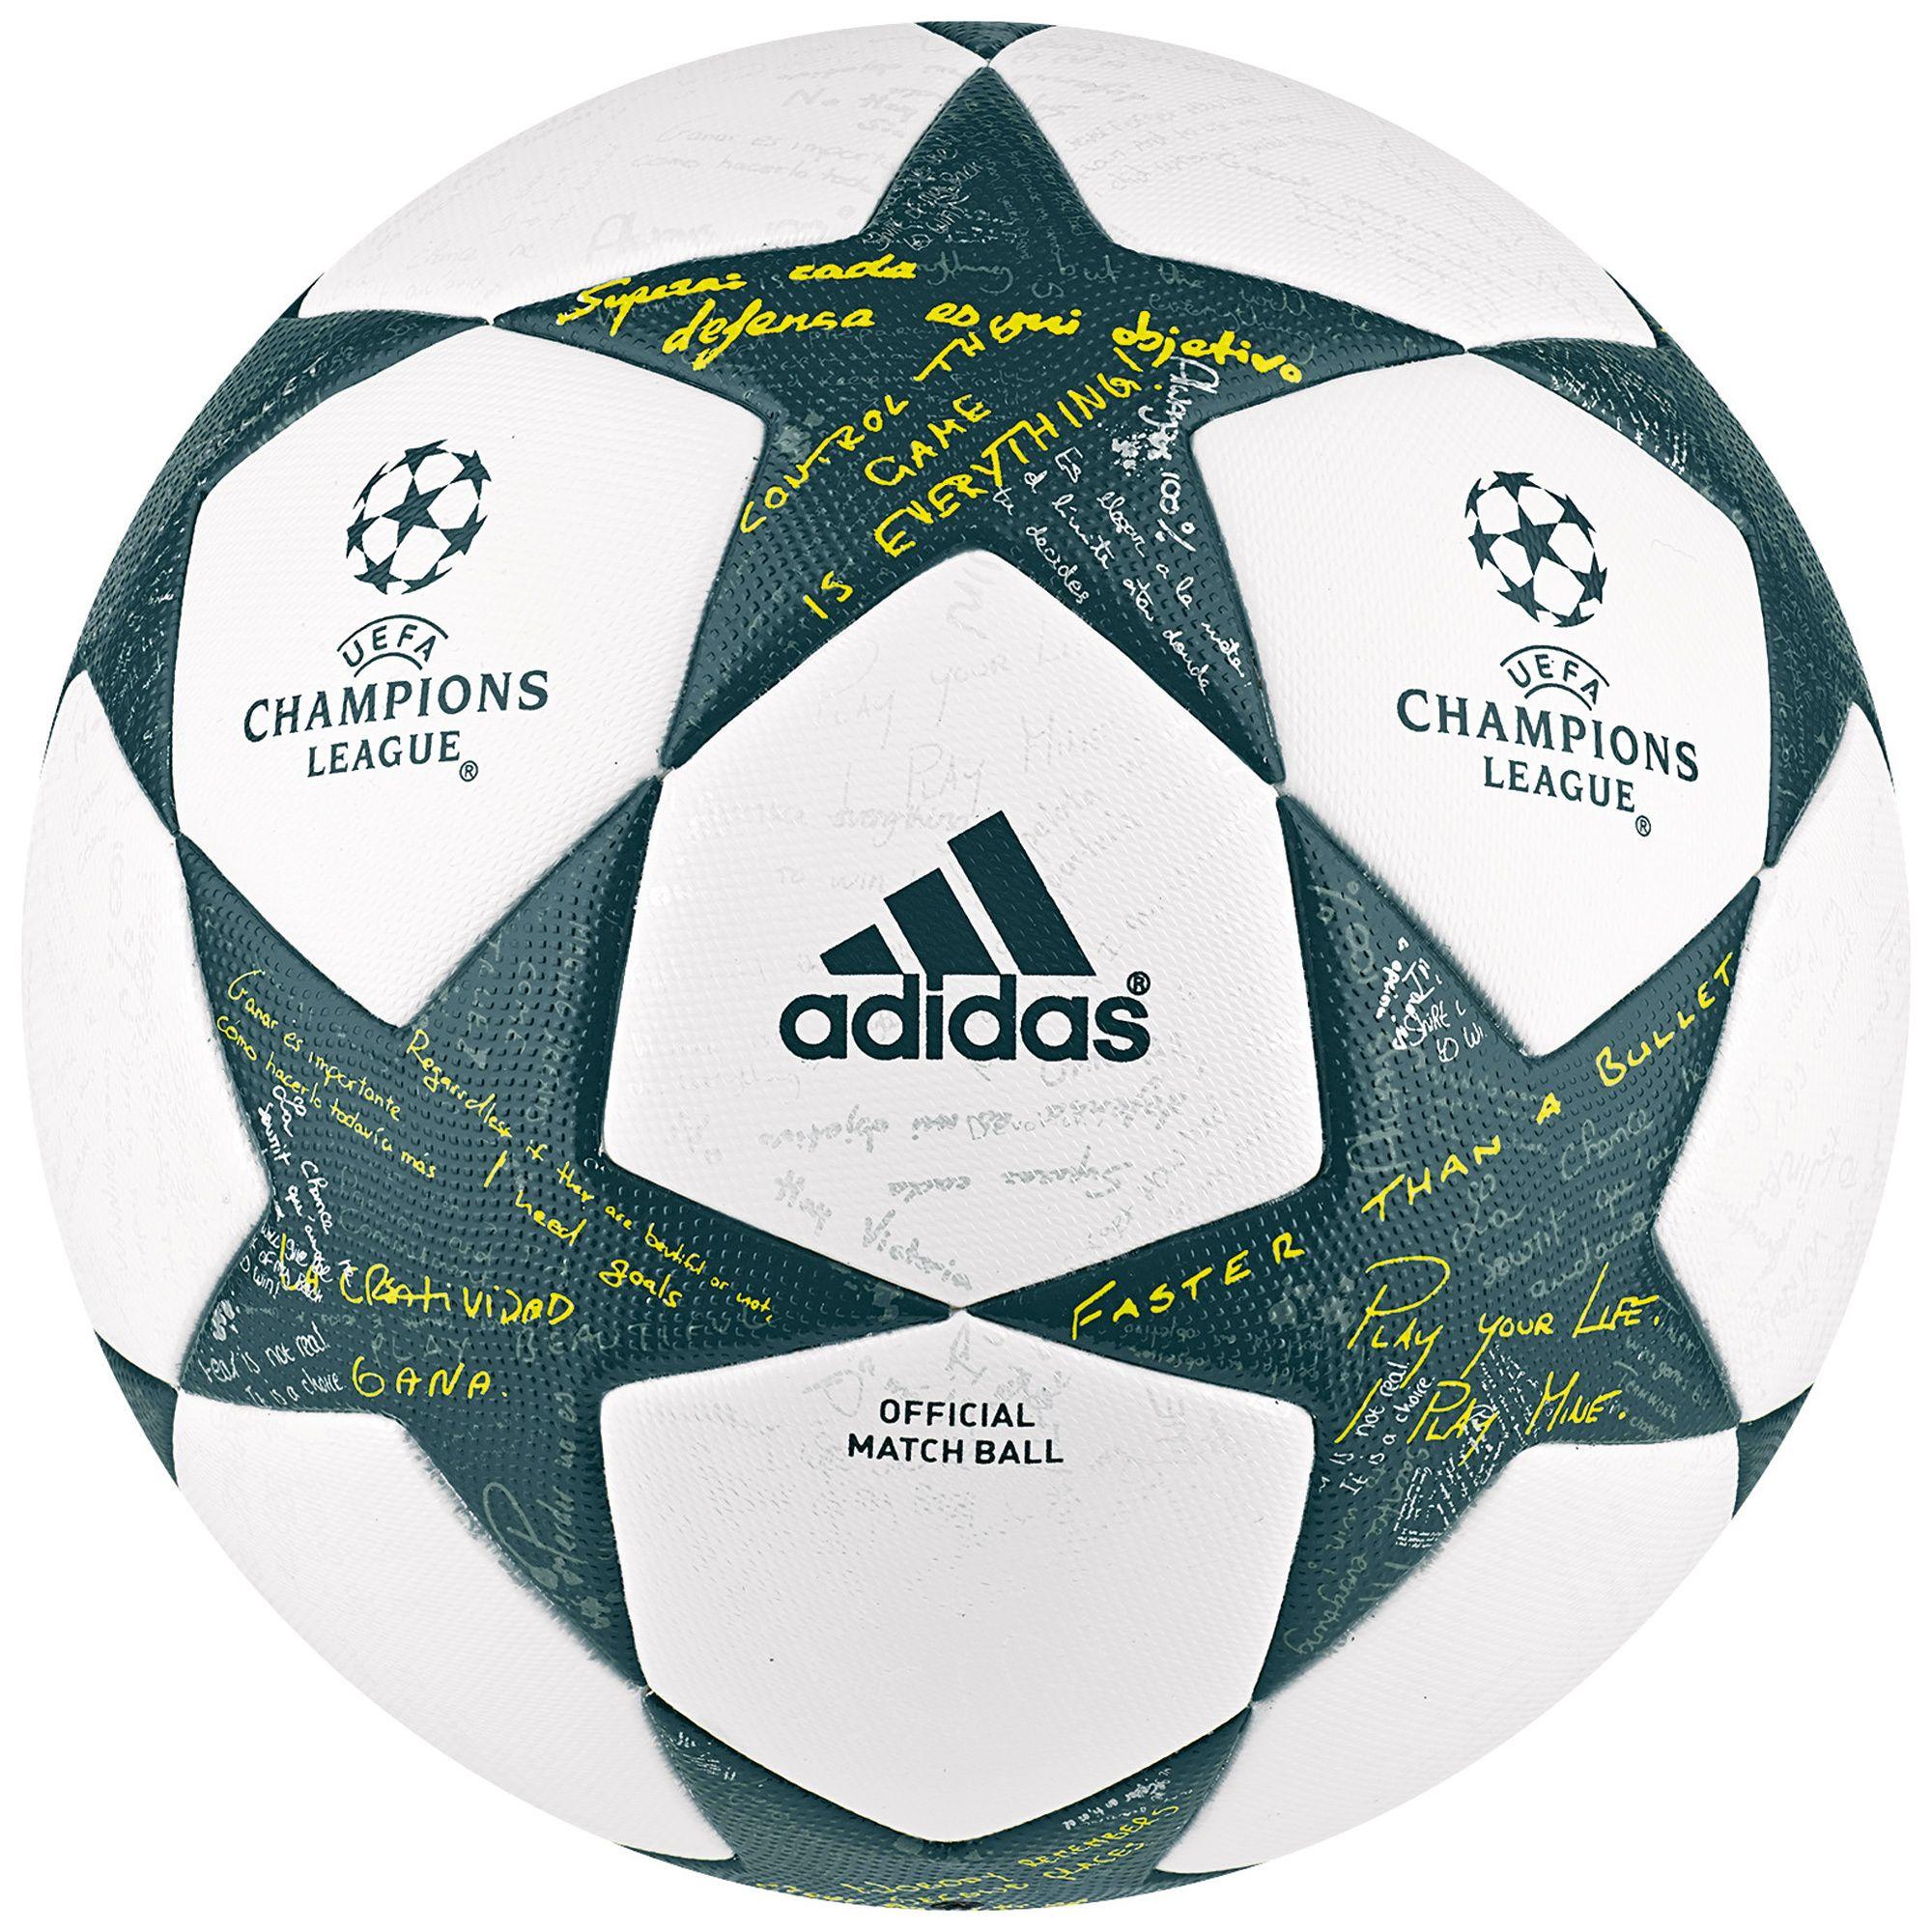 ADIDAS PERFORMANCE adidas Performance Champions League Matchball 2016/2017